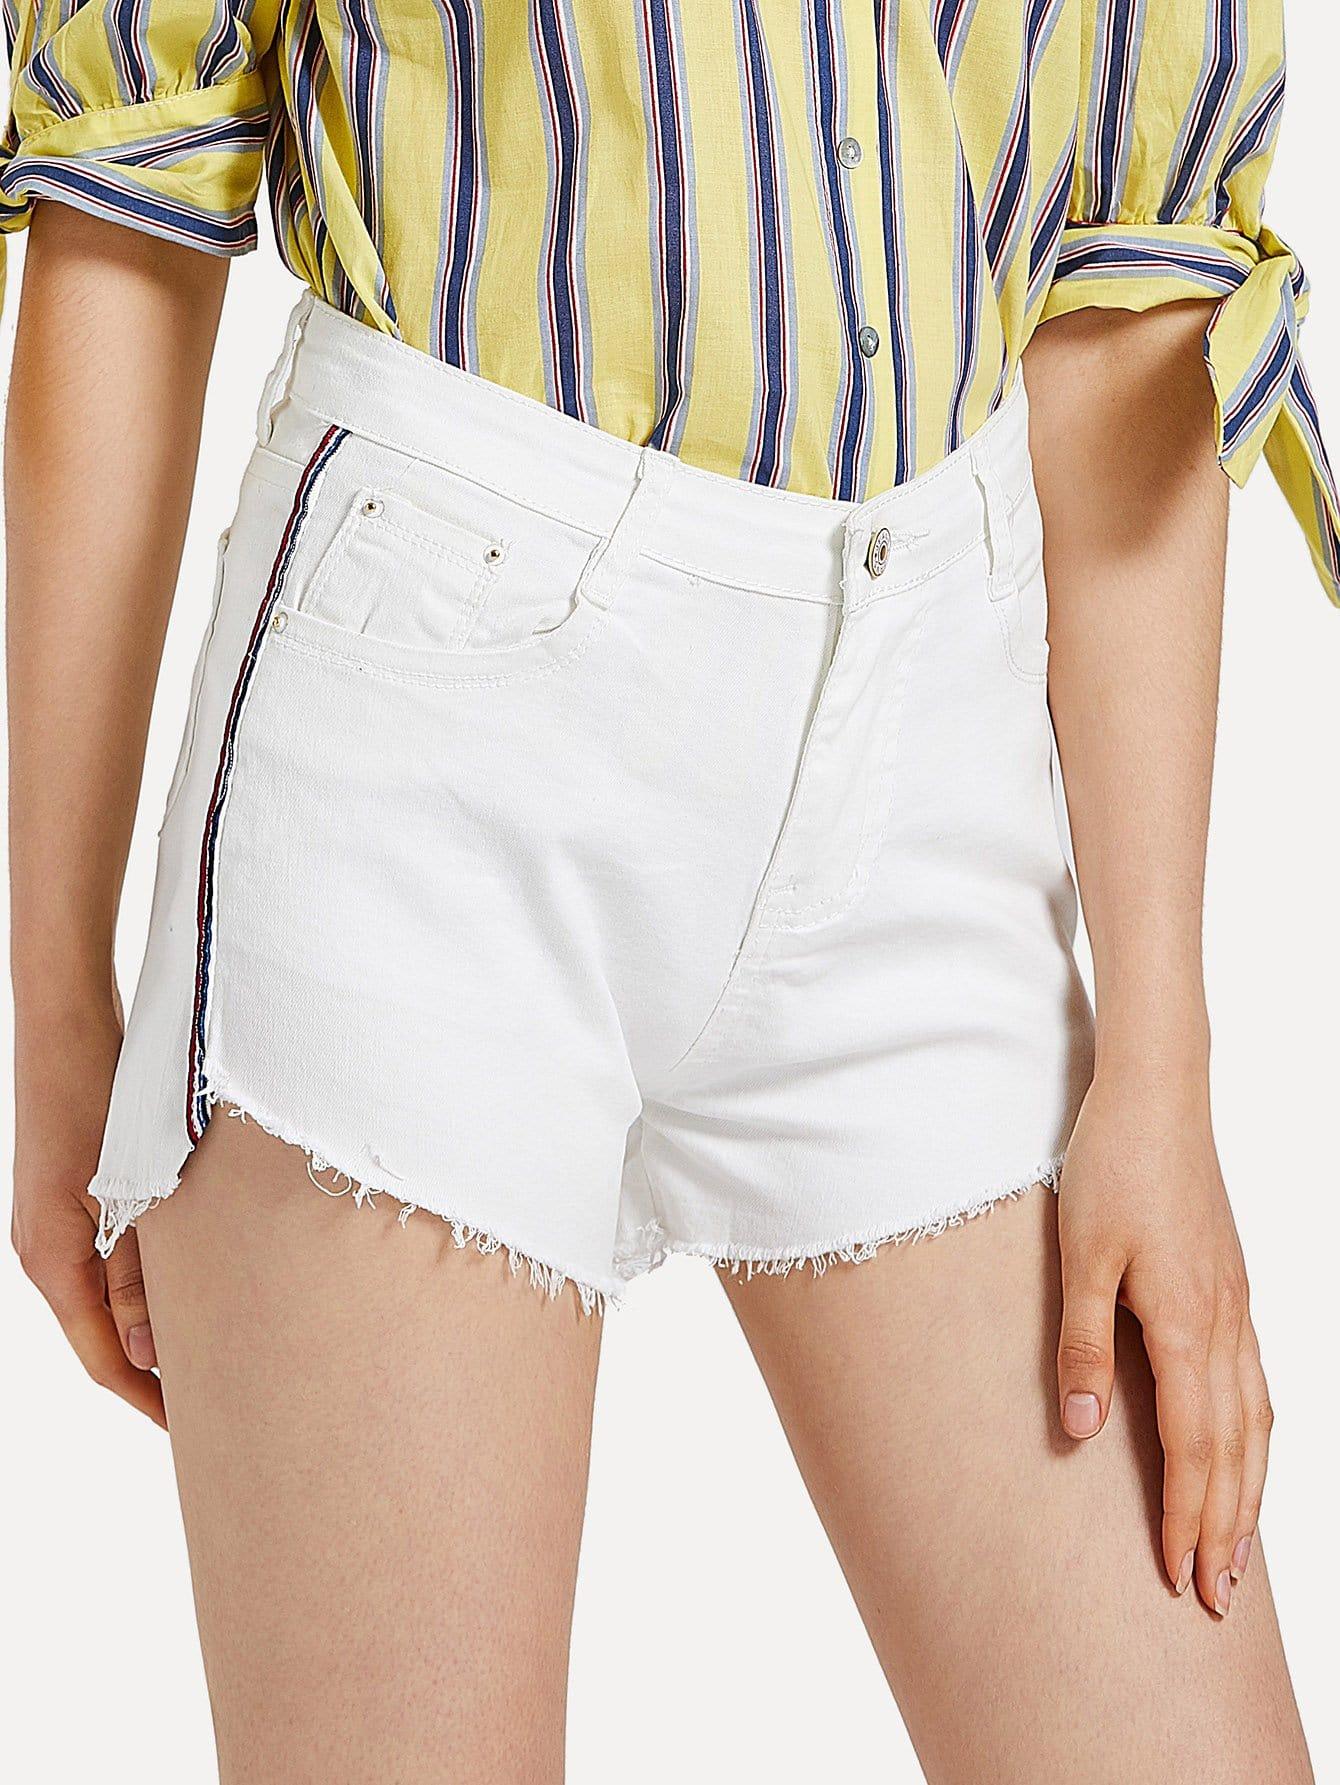 Frayed Hem Striped Denim Shorts sweet wavy hem design striped shorts for women